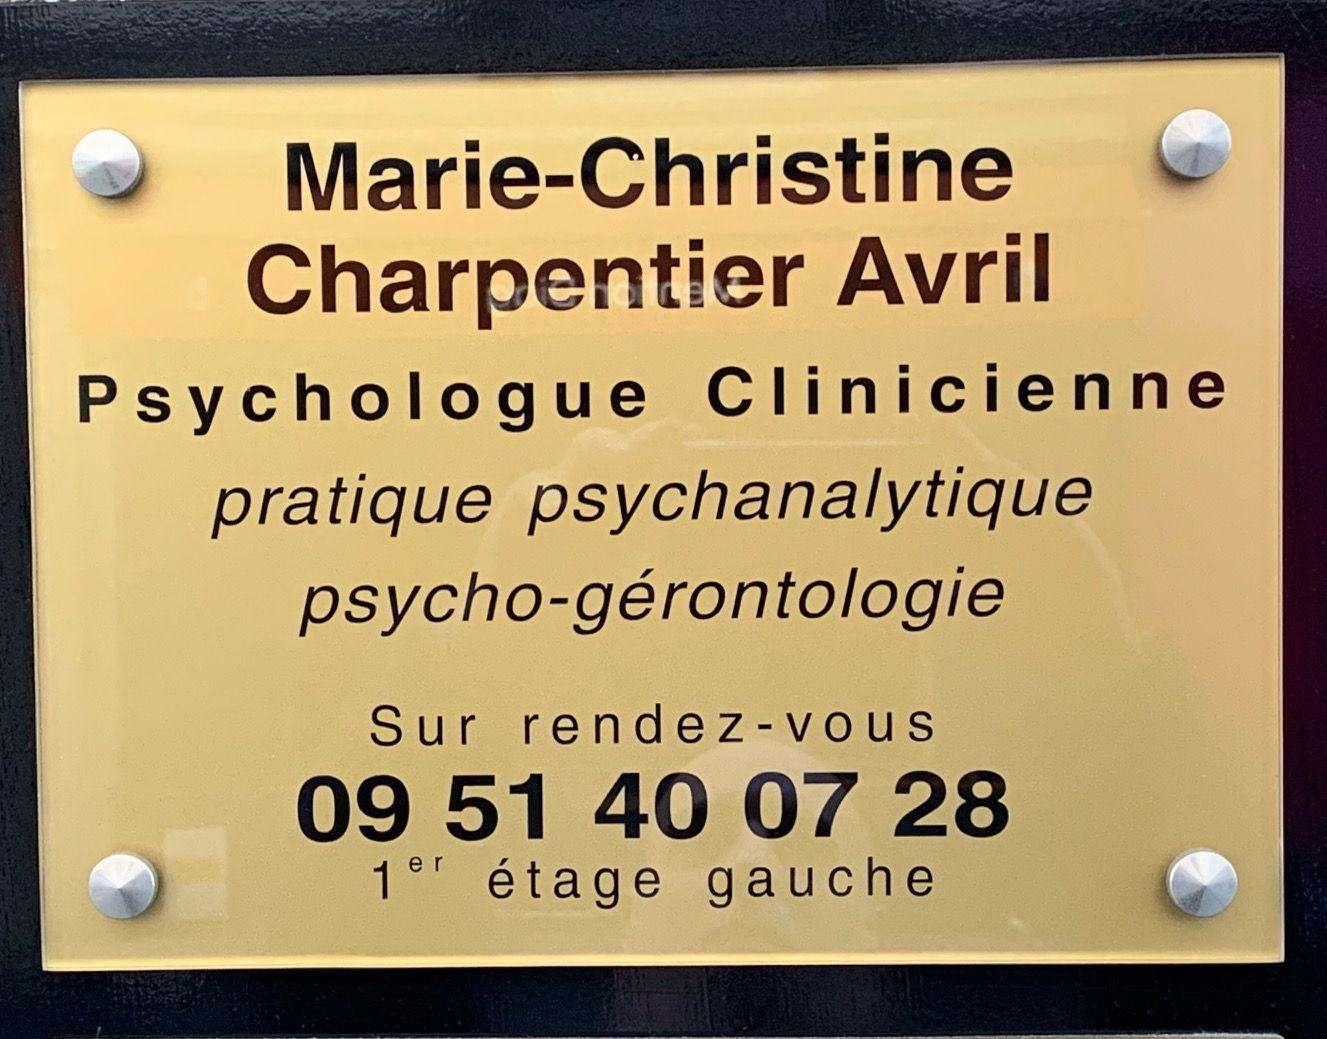 Charpentier Avril Marie-Christine